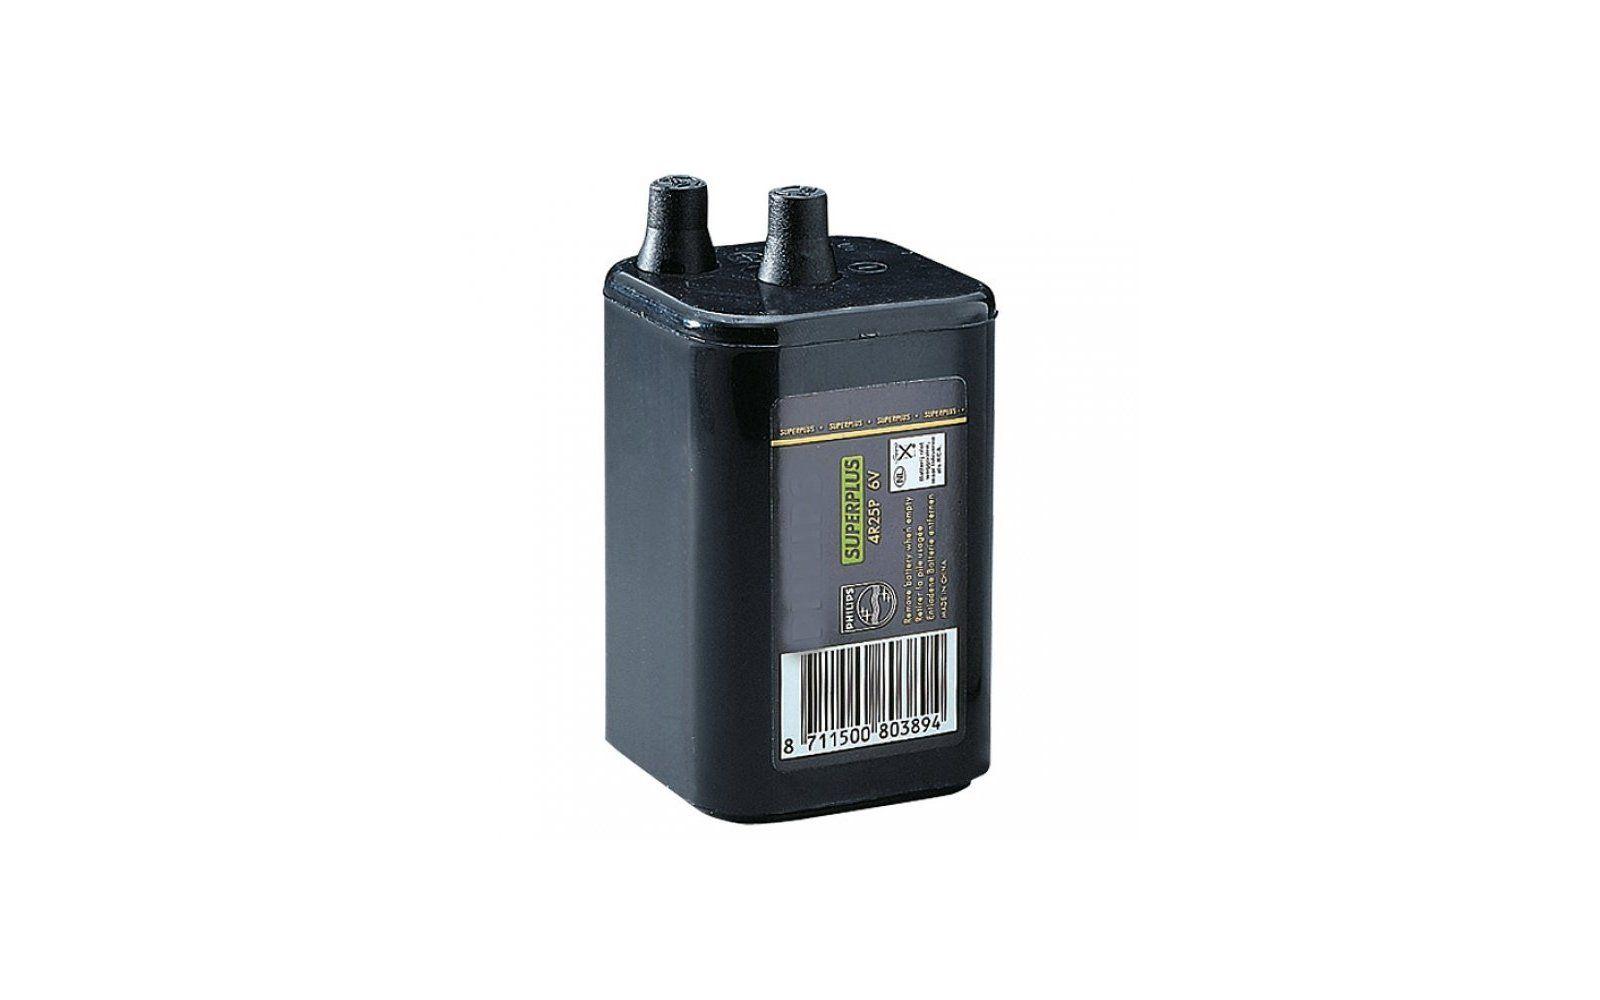 Blockbatterie 6 Volt Fritz Berger Campingbedarf